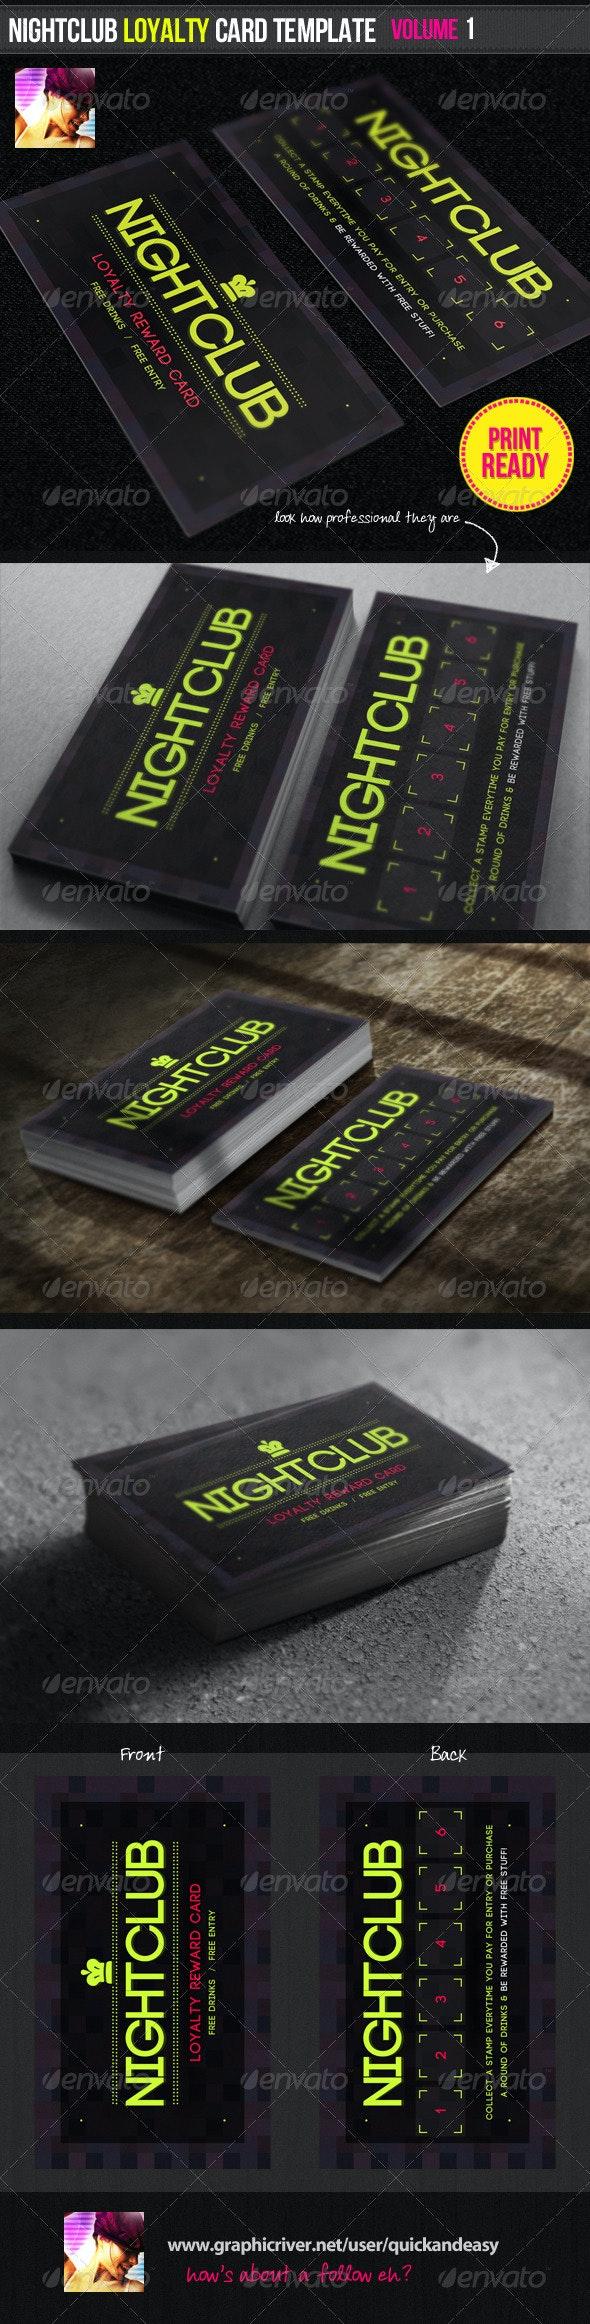 Nightclub Loyalty Card Template - Loyalty Cards Cards & Invites